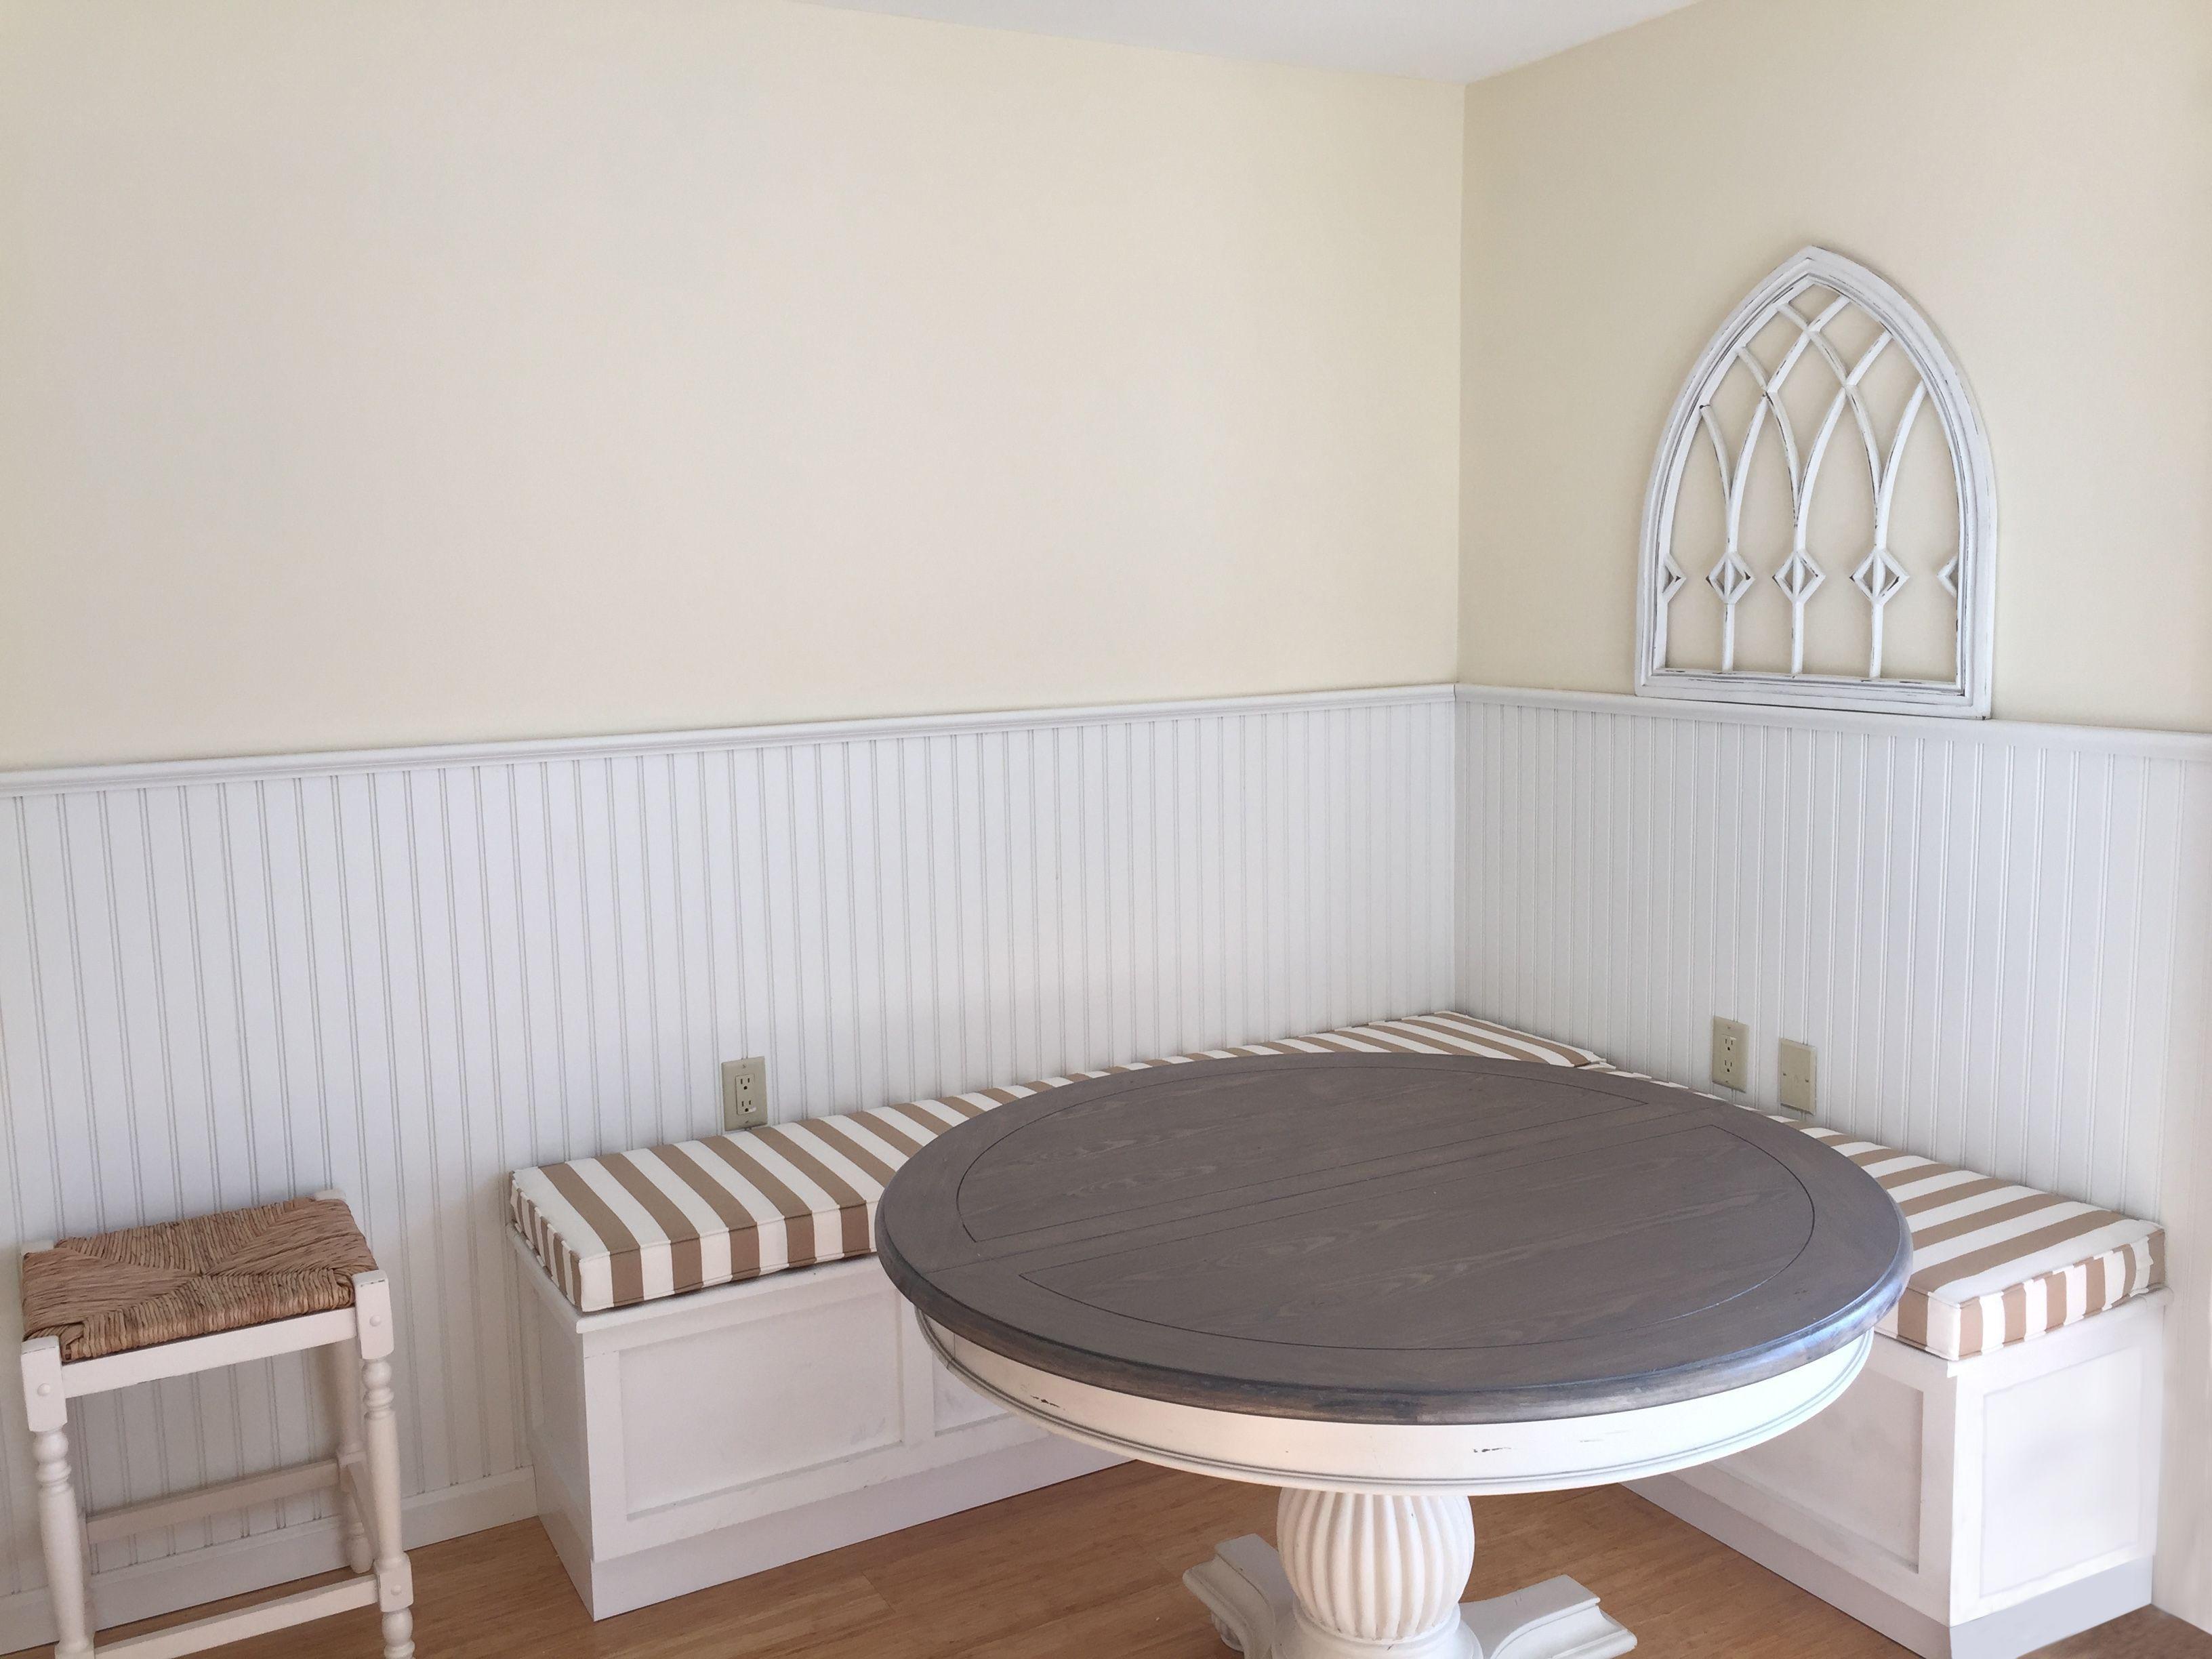 Storage breakfast nooks cushion source sandys pinterest breakfast nook cushions breakfast nooks and nook